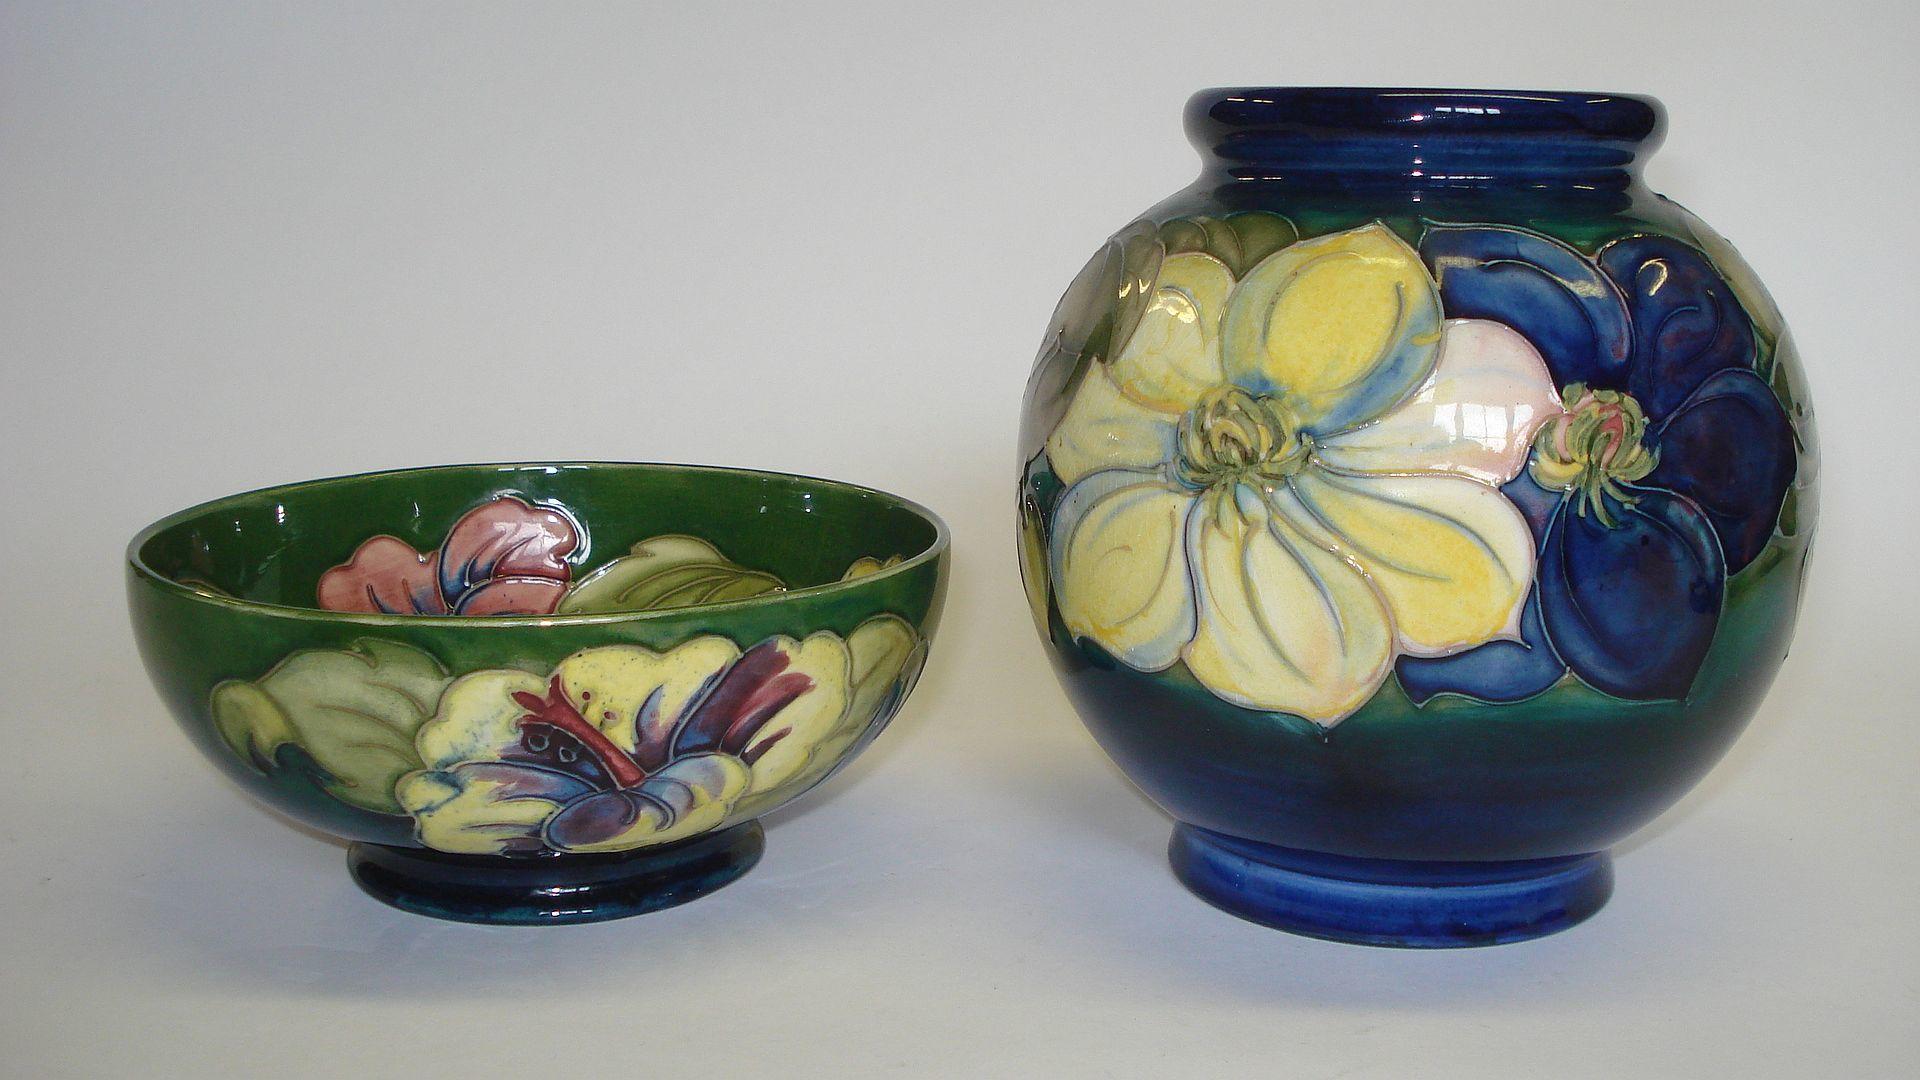 Auktion - Collectable Ceramics & 20th Century Prints am 17 08 2010